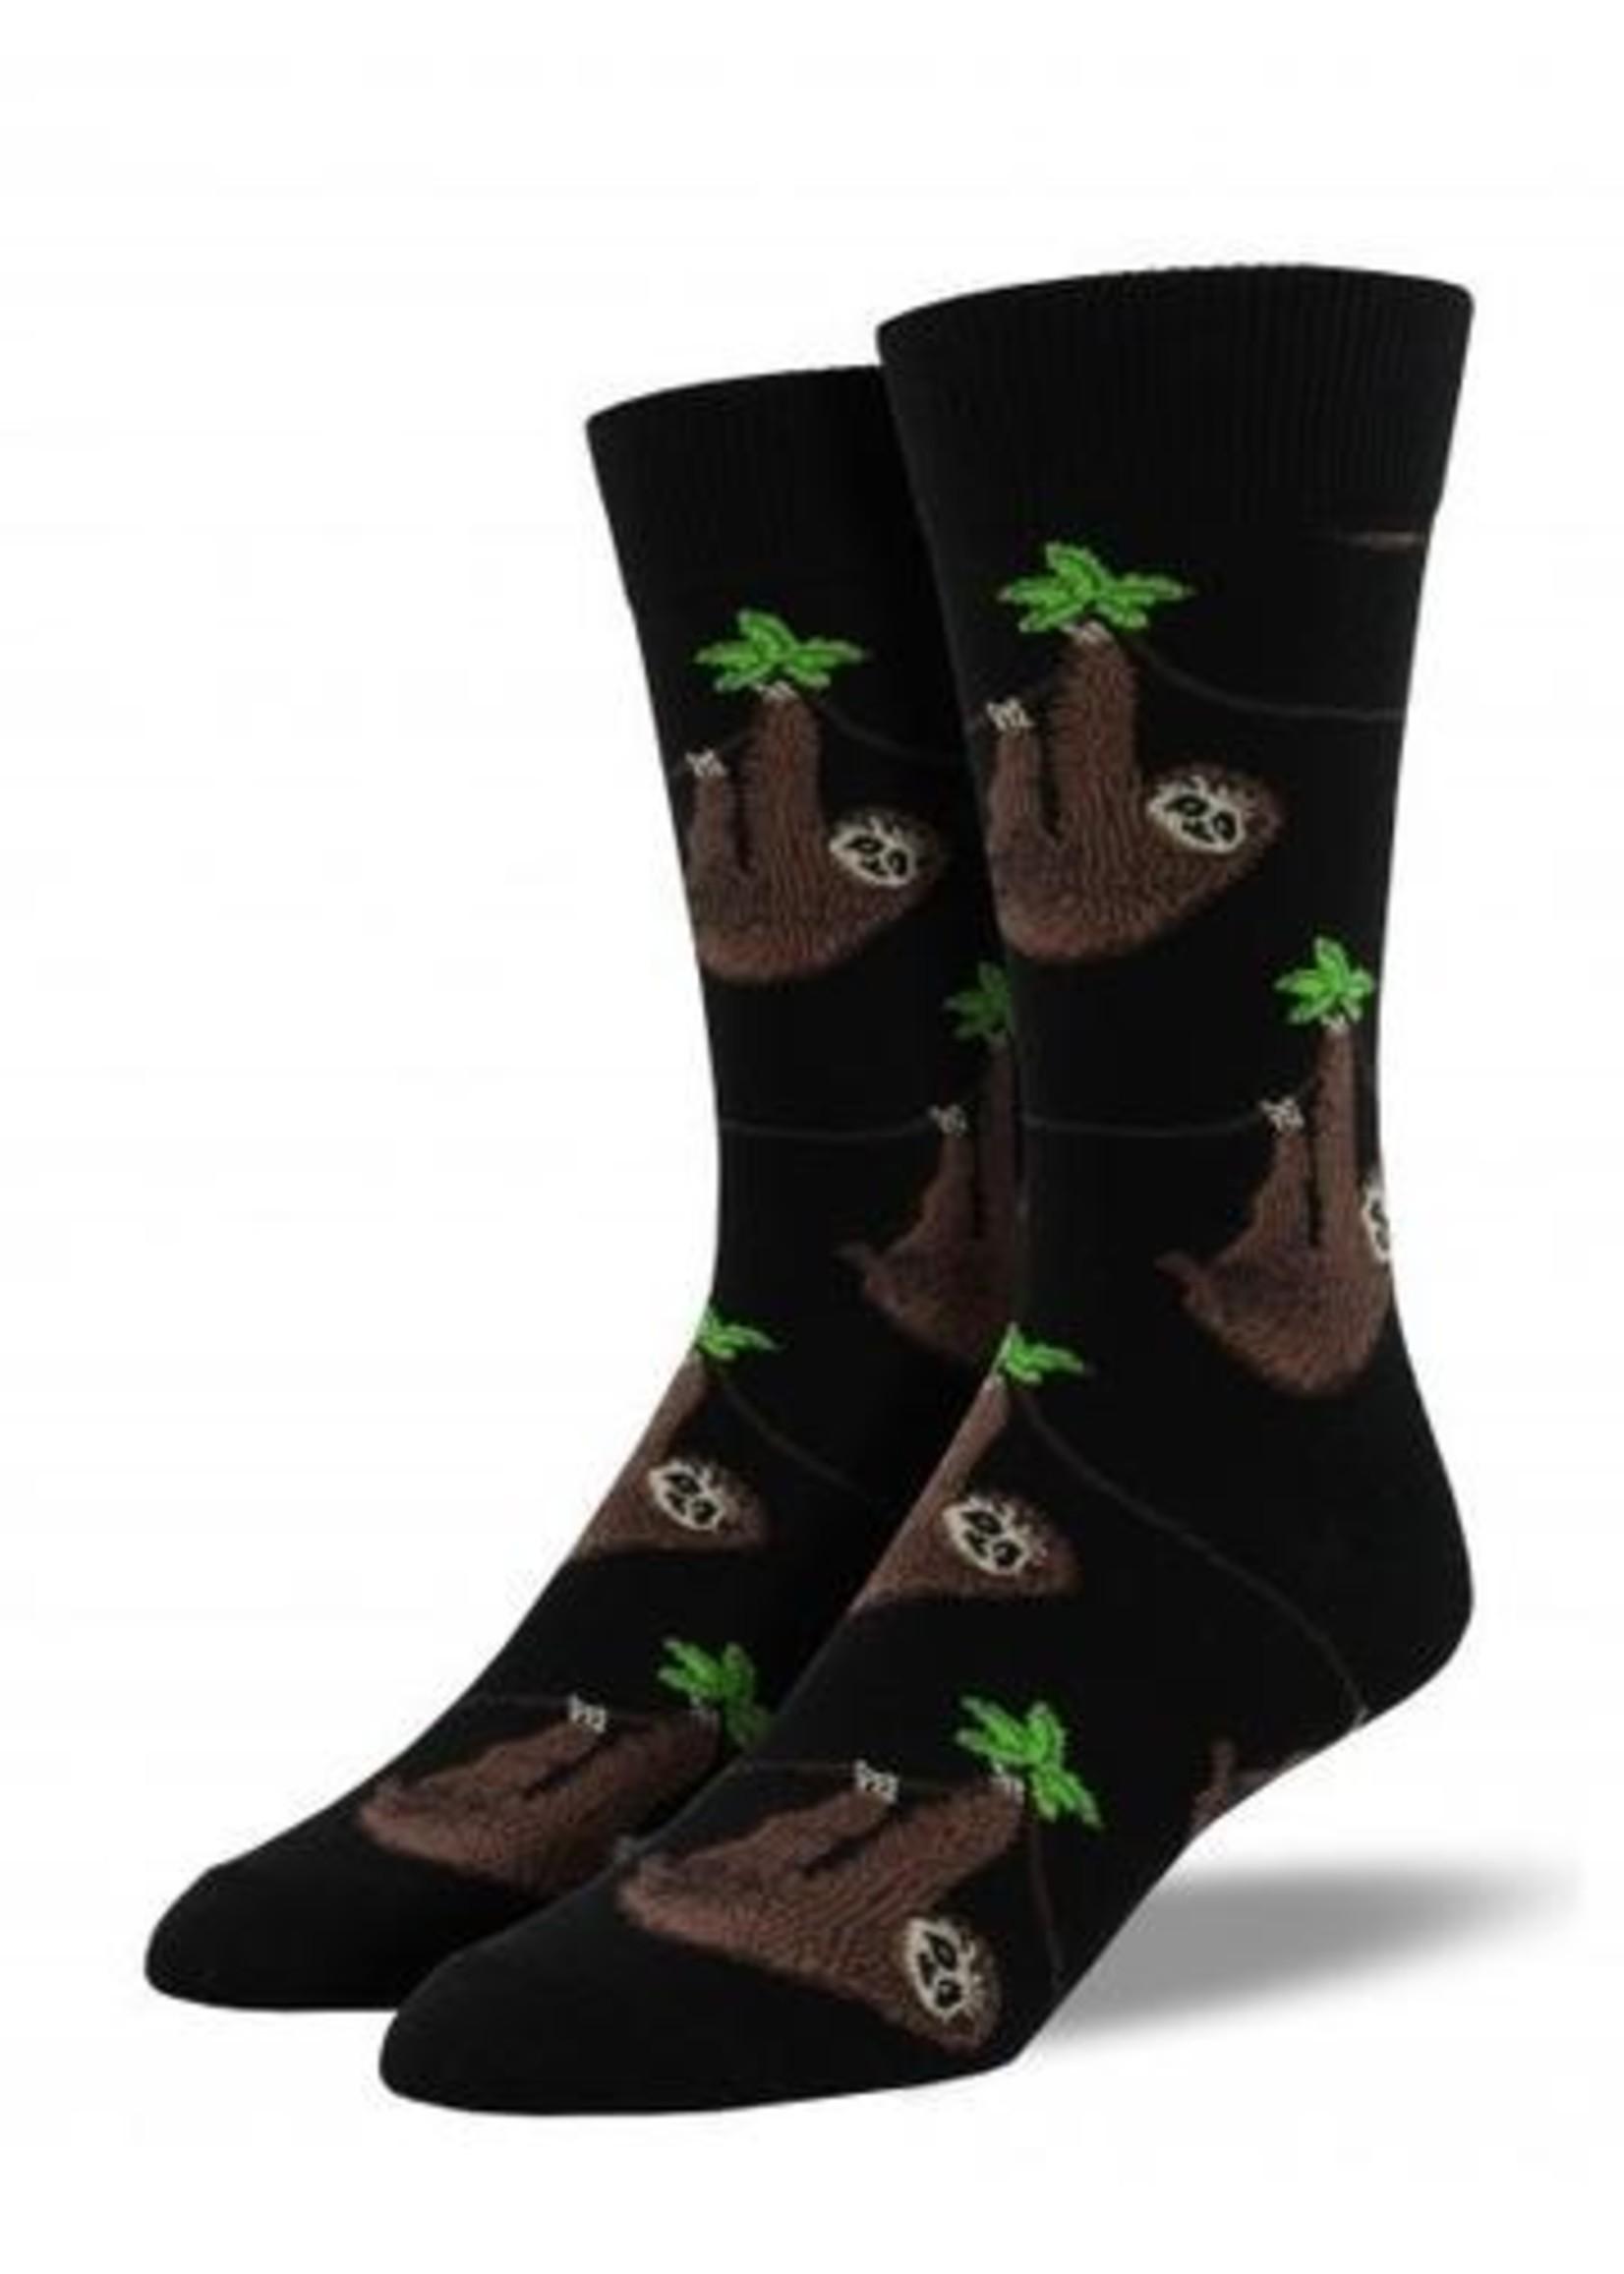 Socksmith Canada Sloth Socks